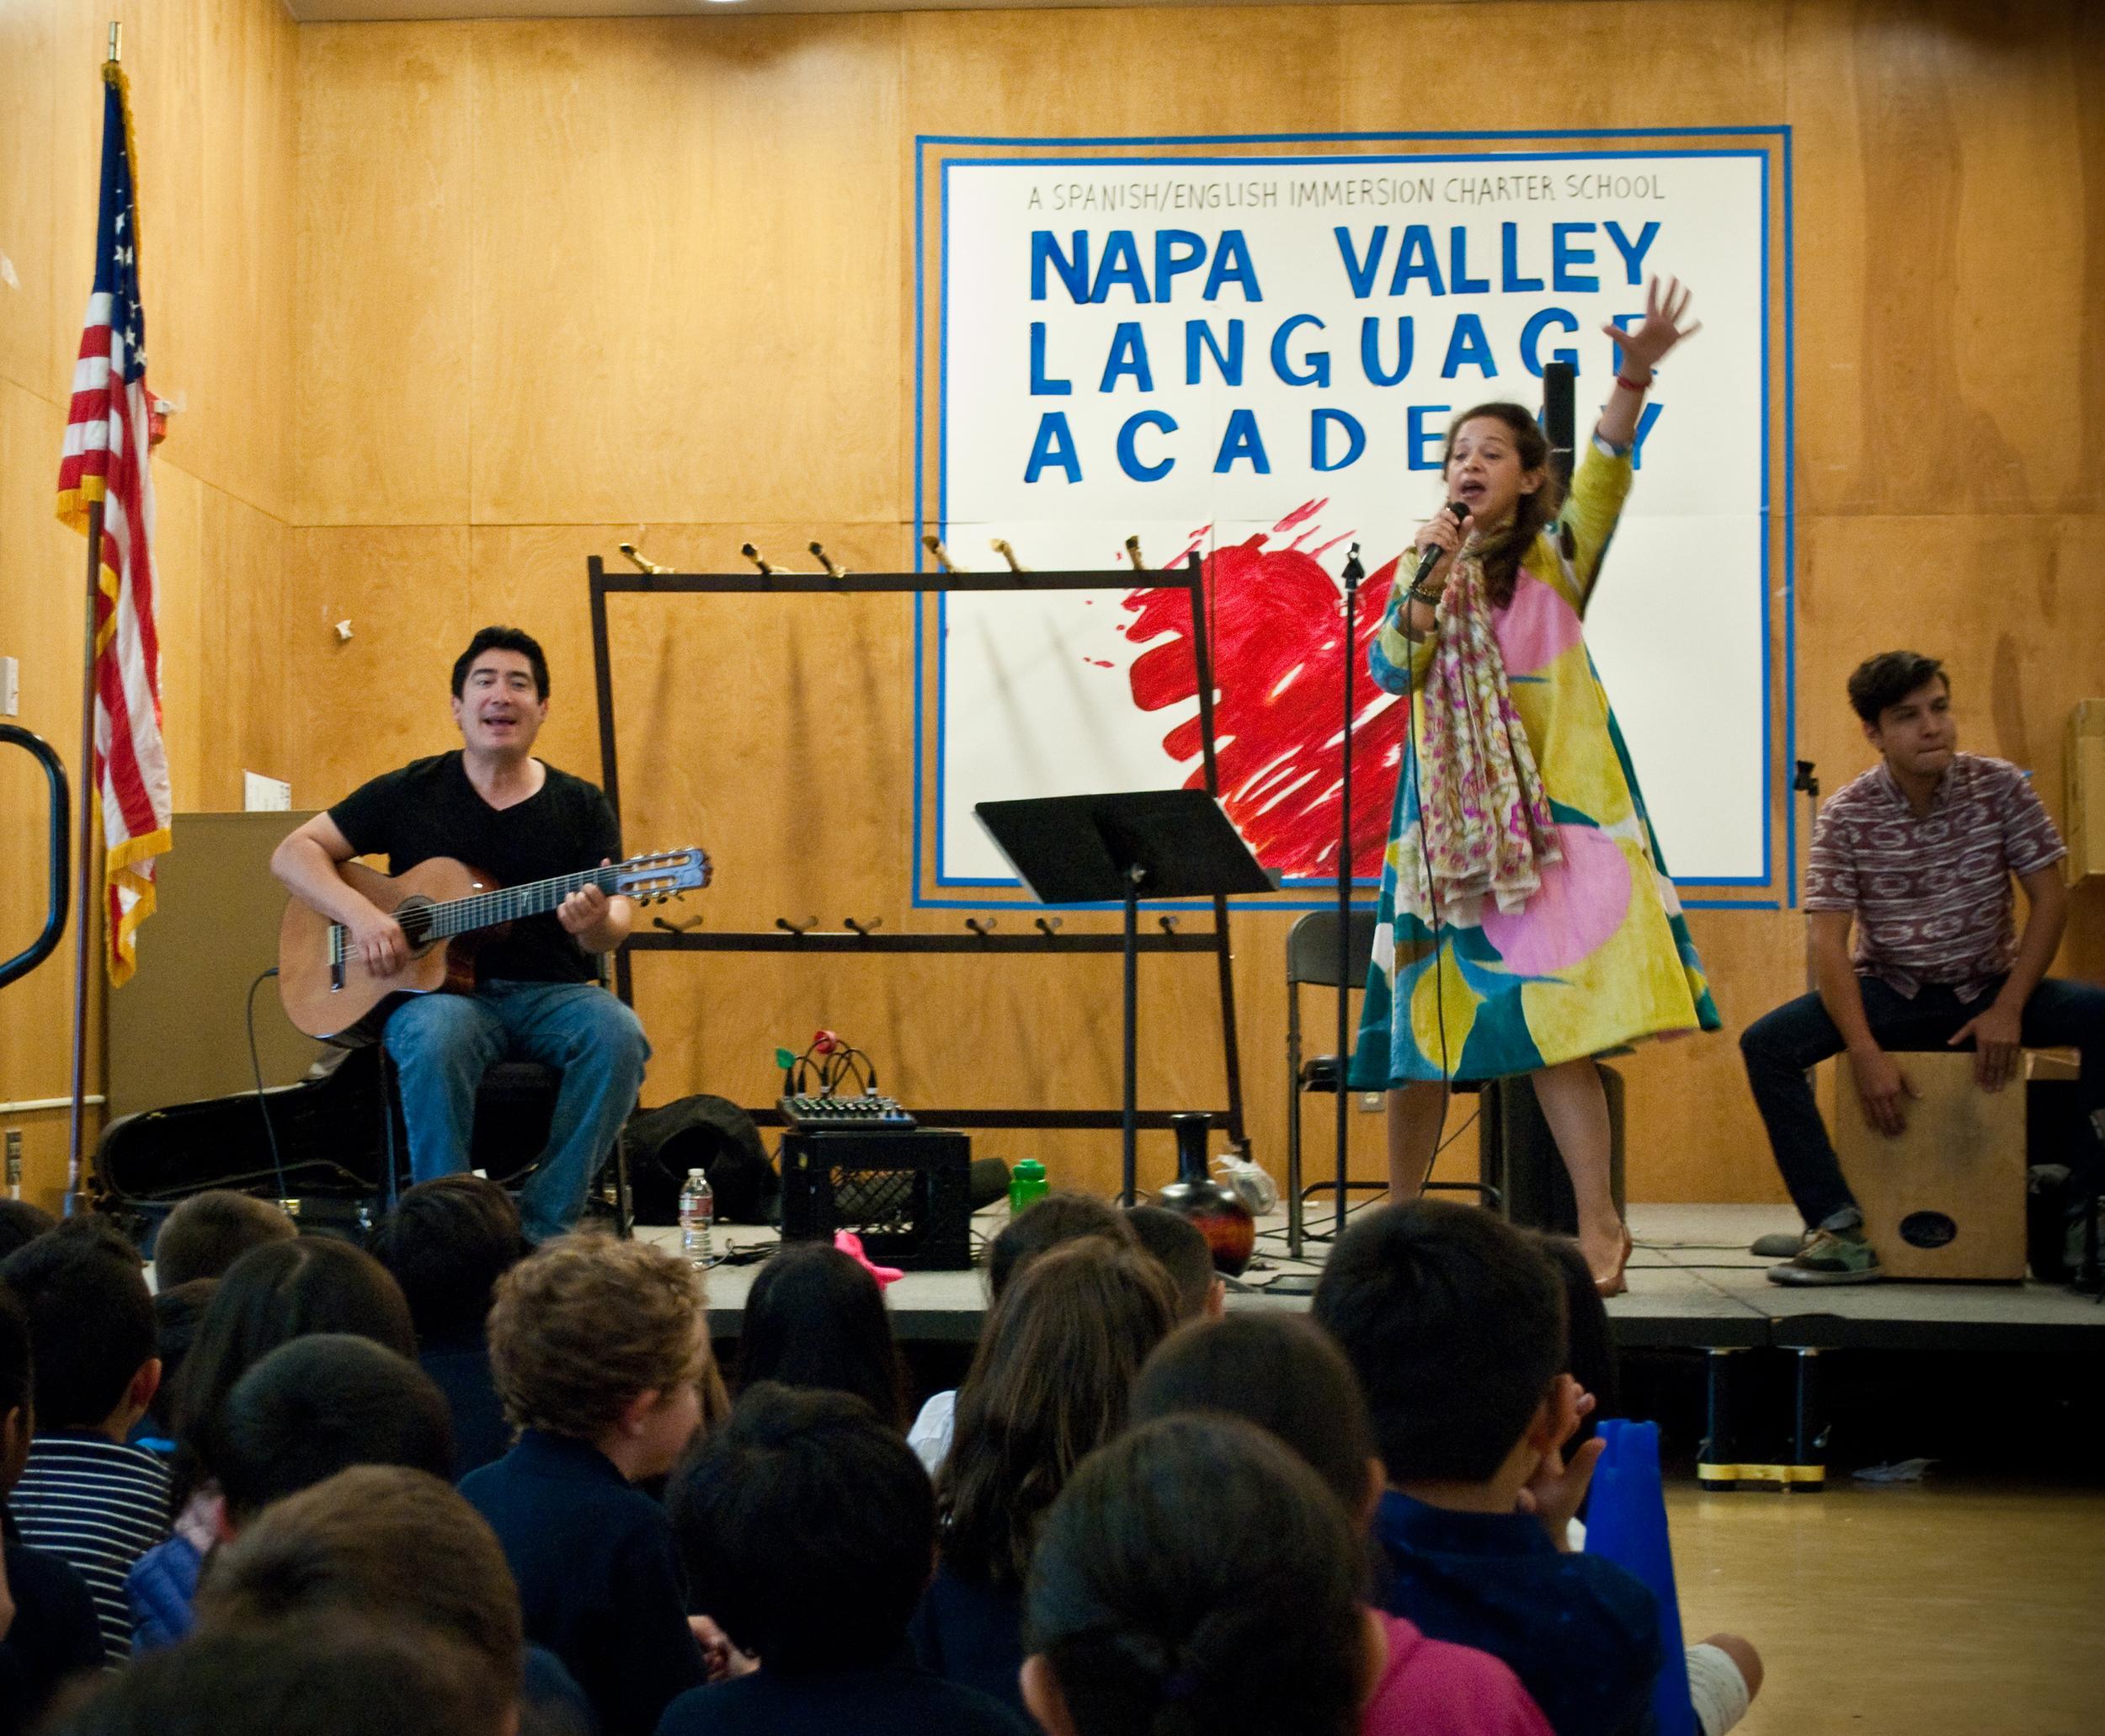 Perla Batalla performs at the Napa Valley Language Academy